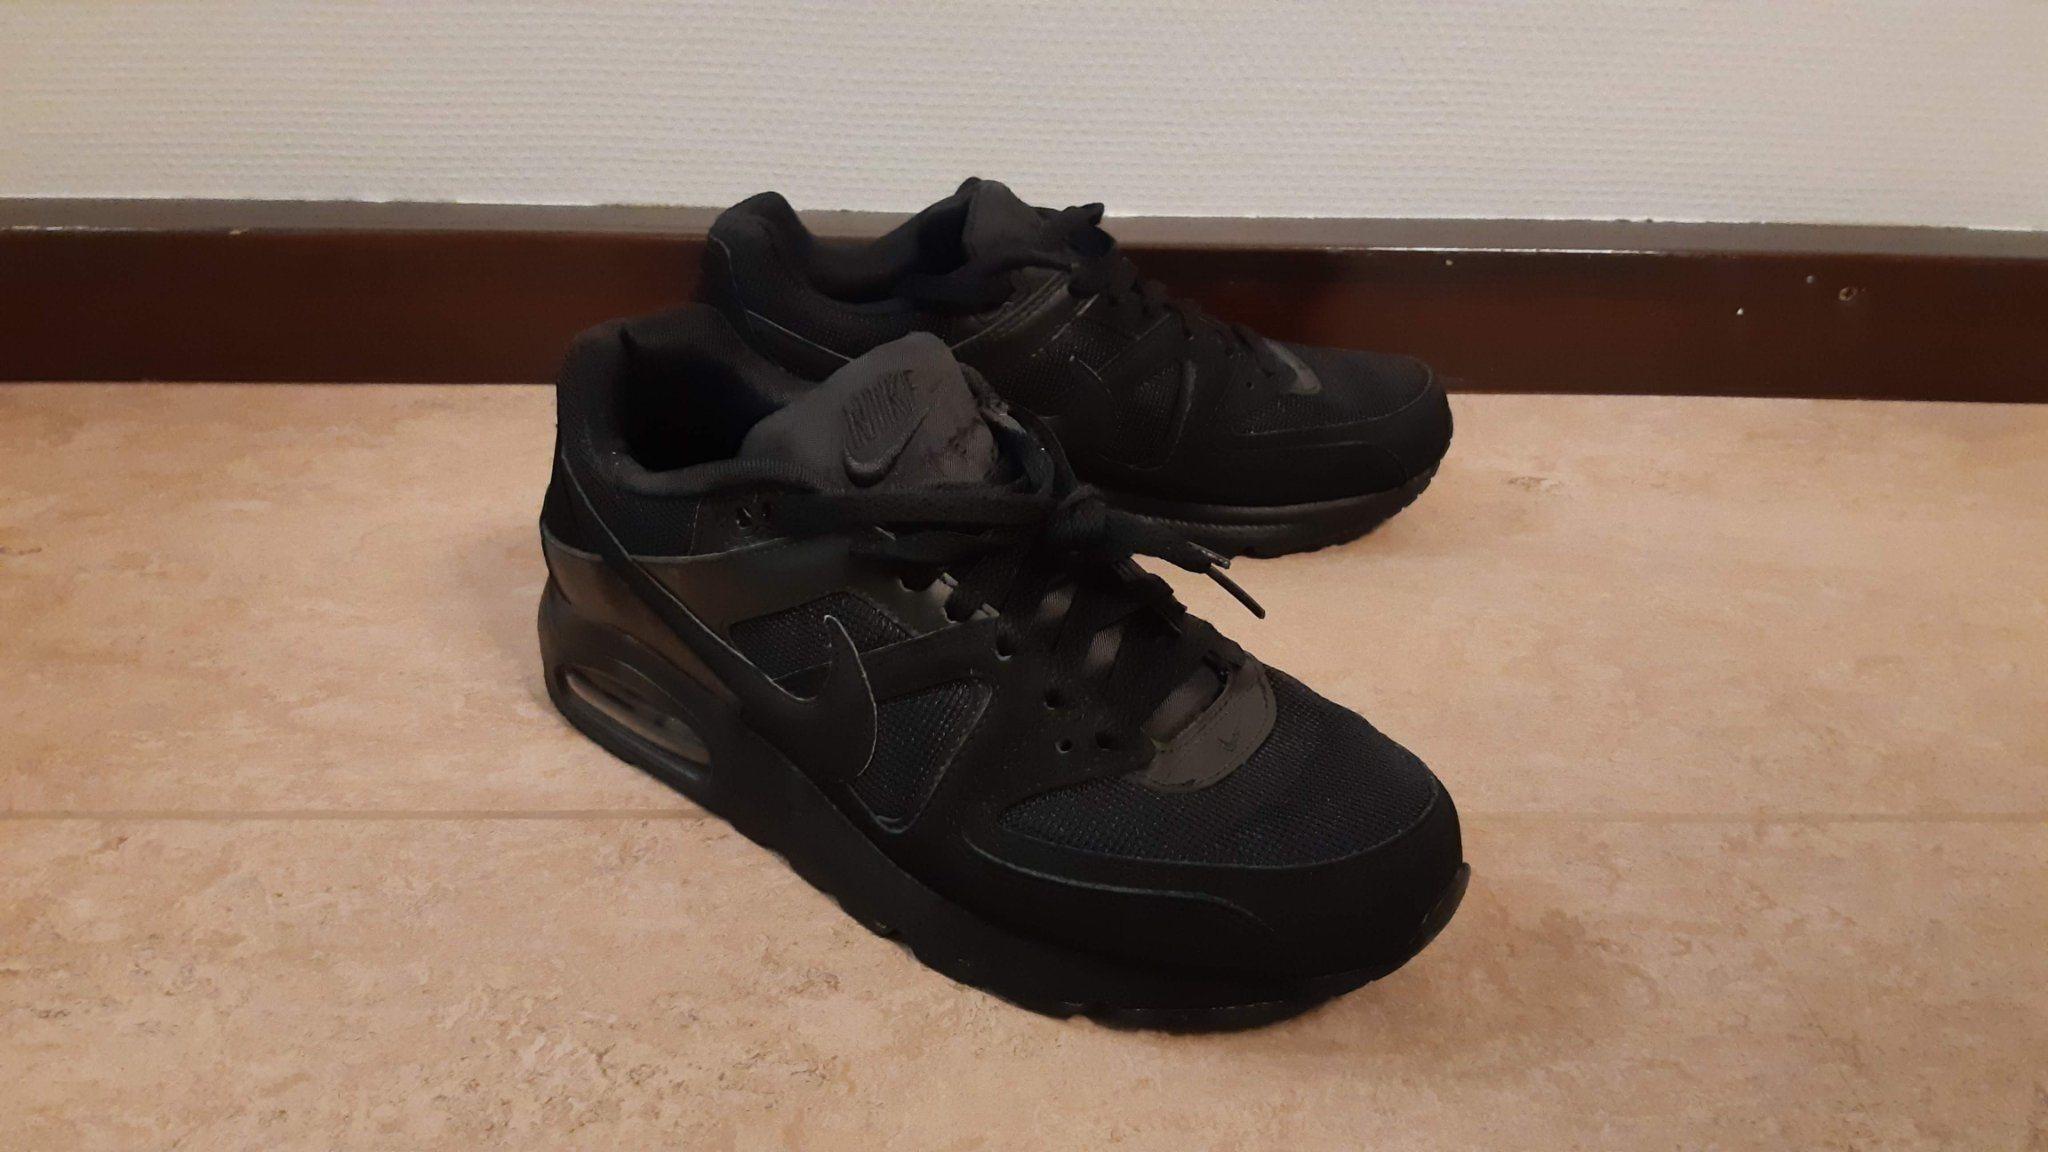 the latest 9067f 7cd8f Nike Air Max Command Black Edition (Strl 42.5) Original